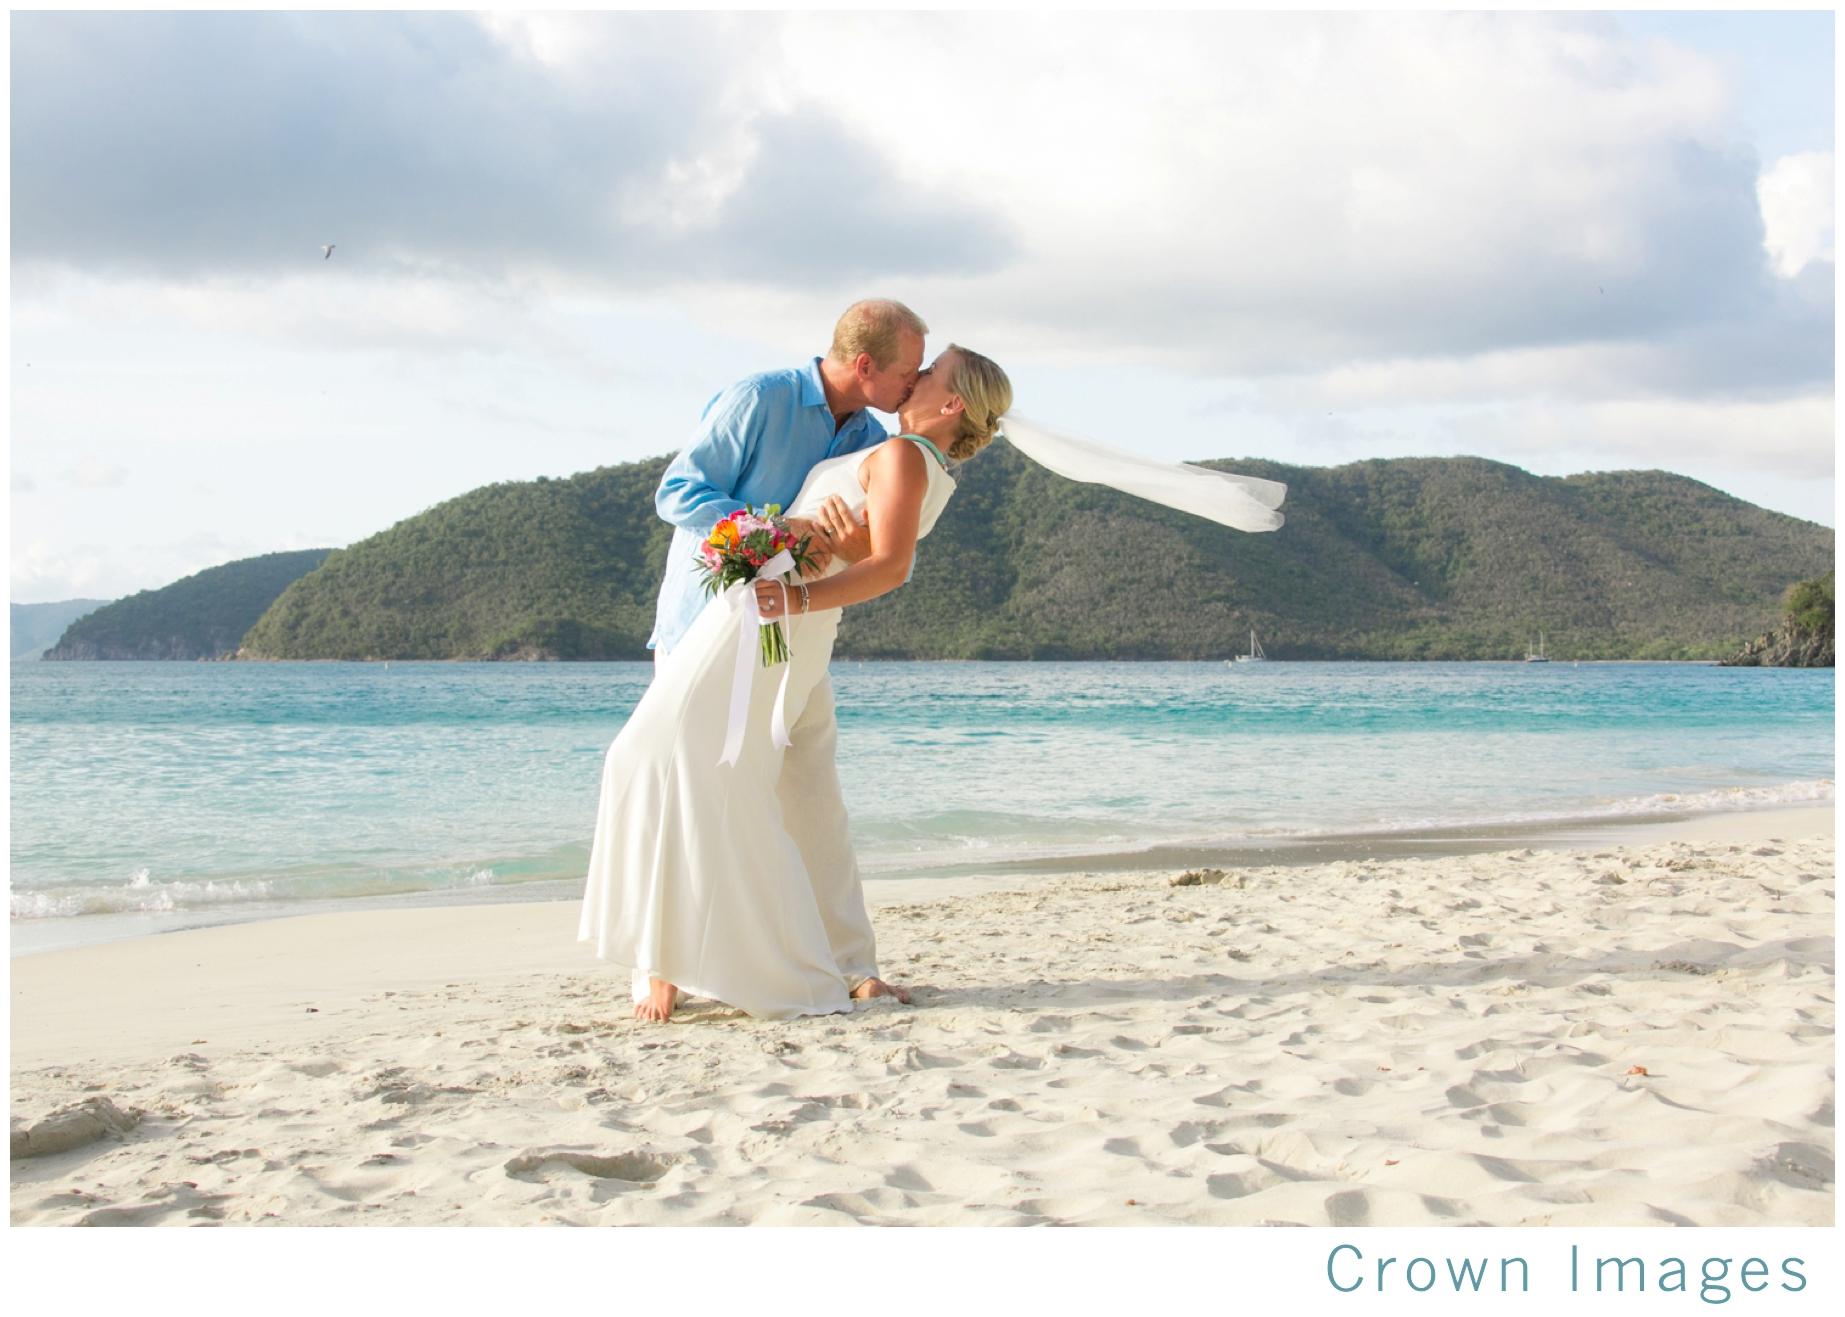 st_john_wedding_photographer_crown_images_0080.jpg